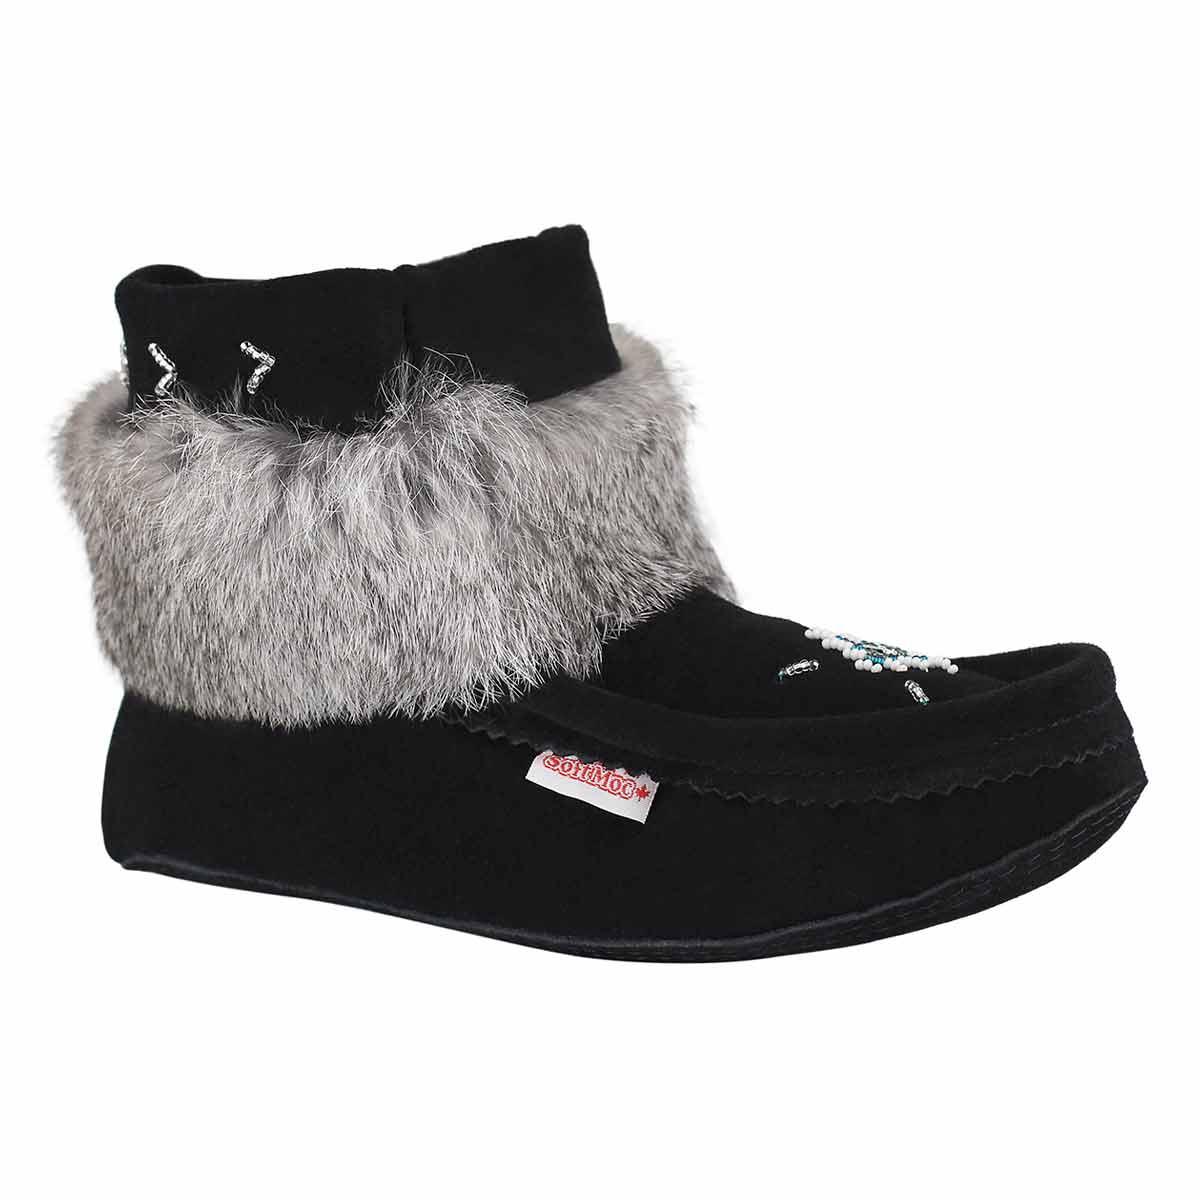 Lds black/grey suede mukluk